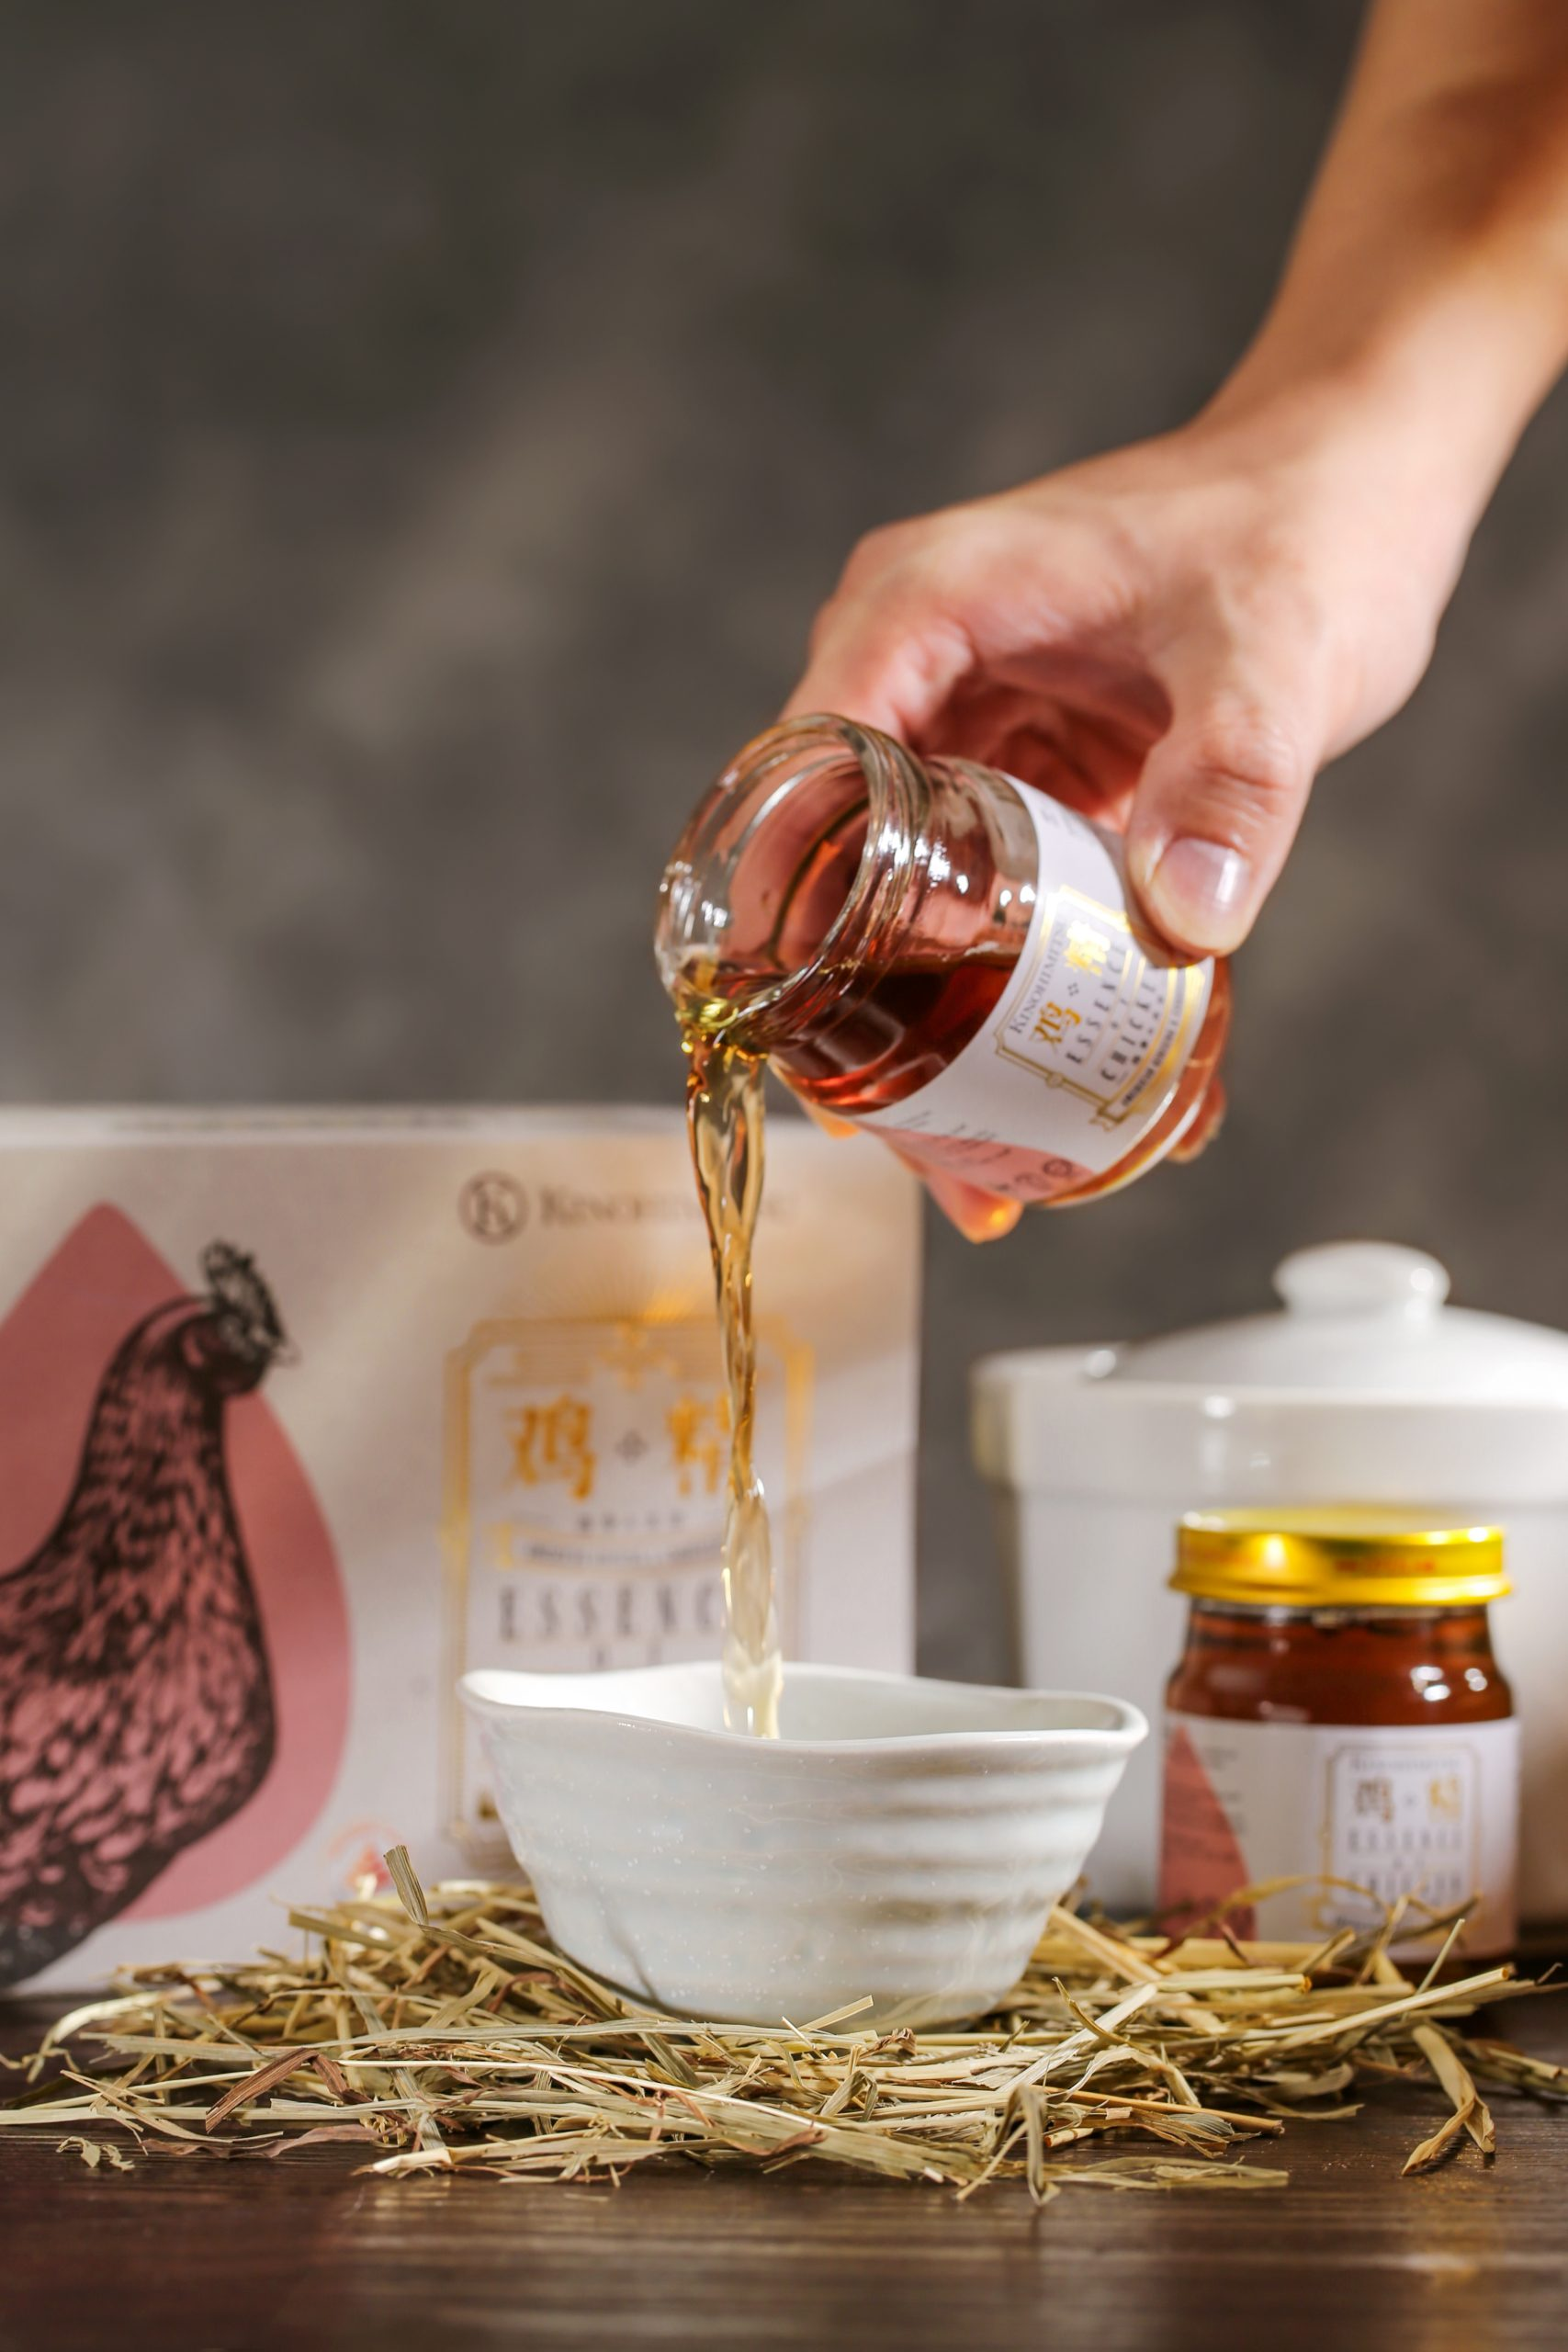 Top 4 amazing benefits of drinking Chicken Essence